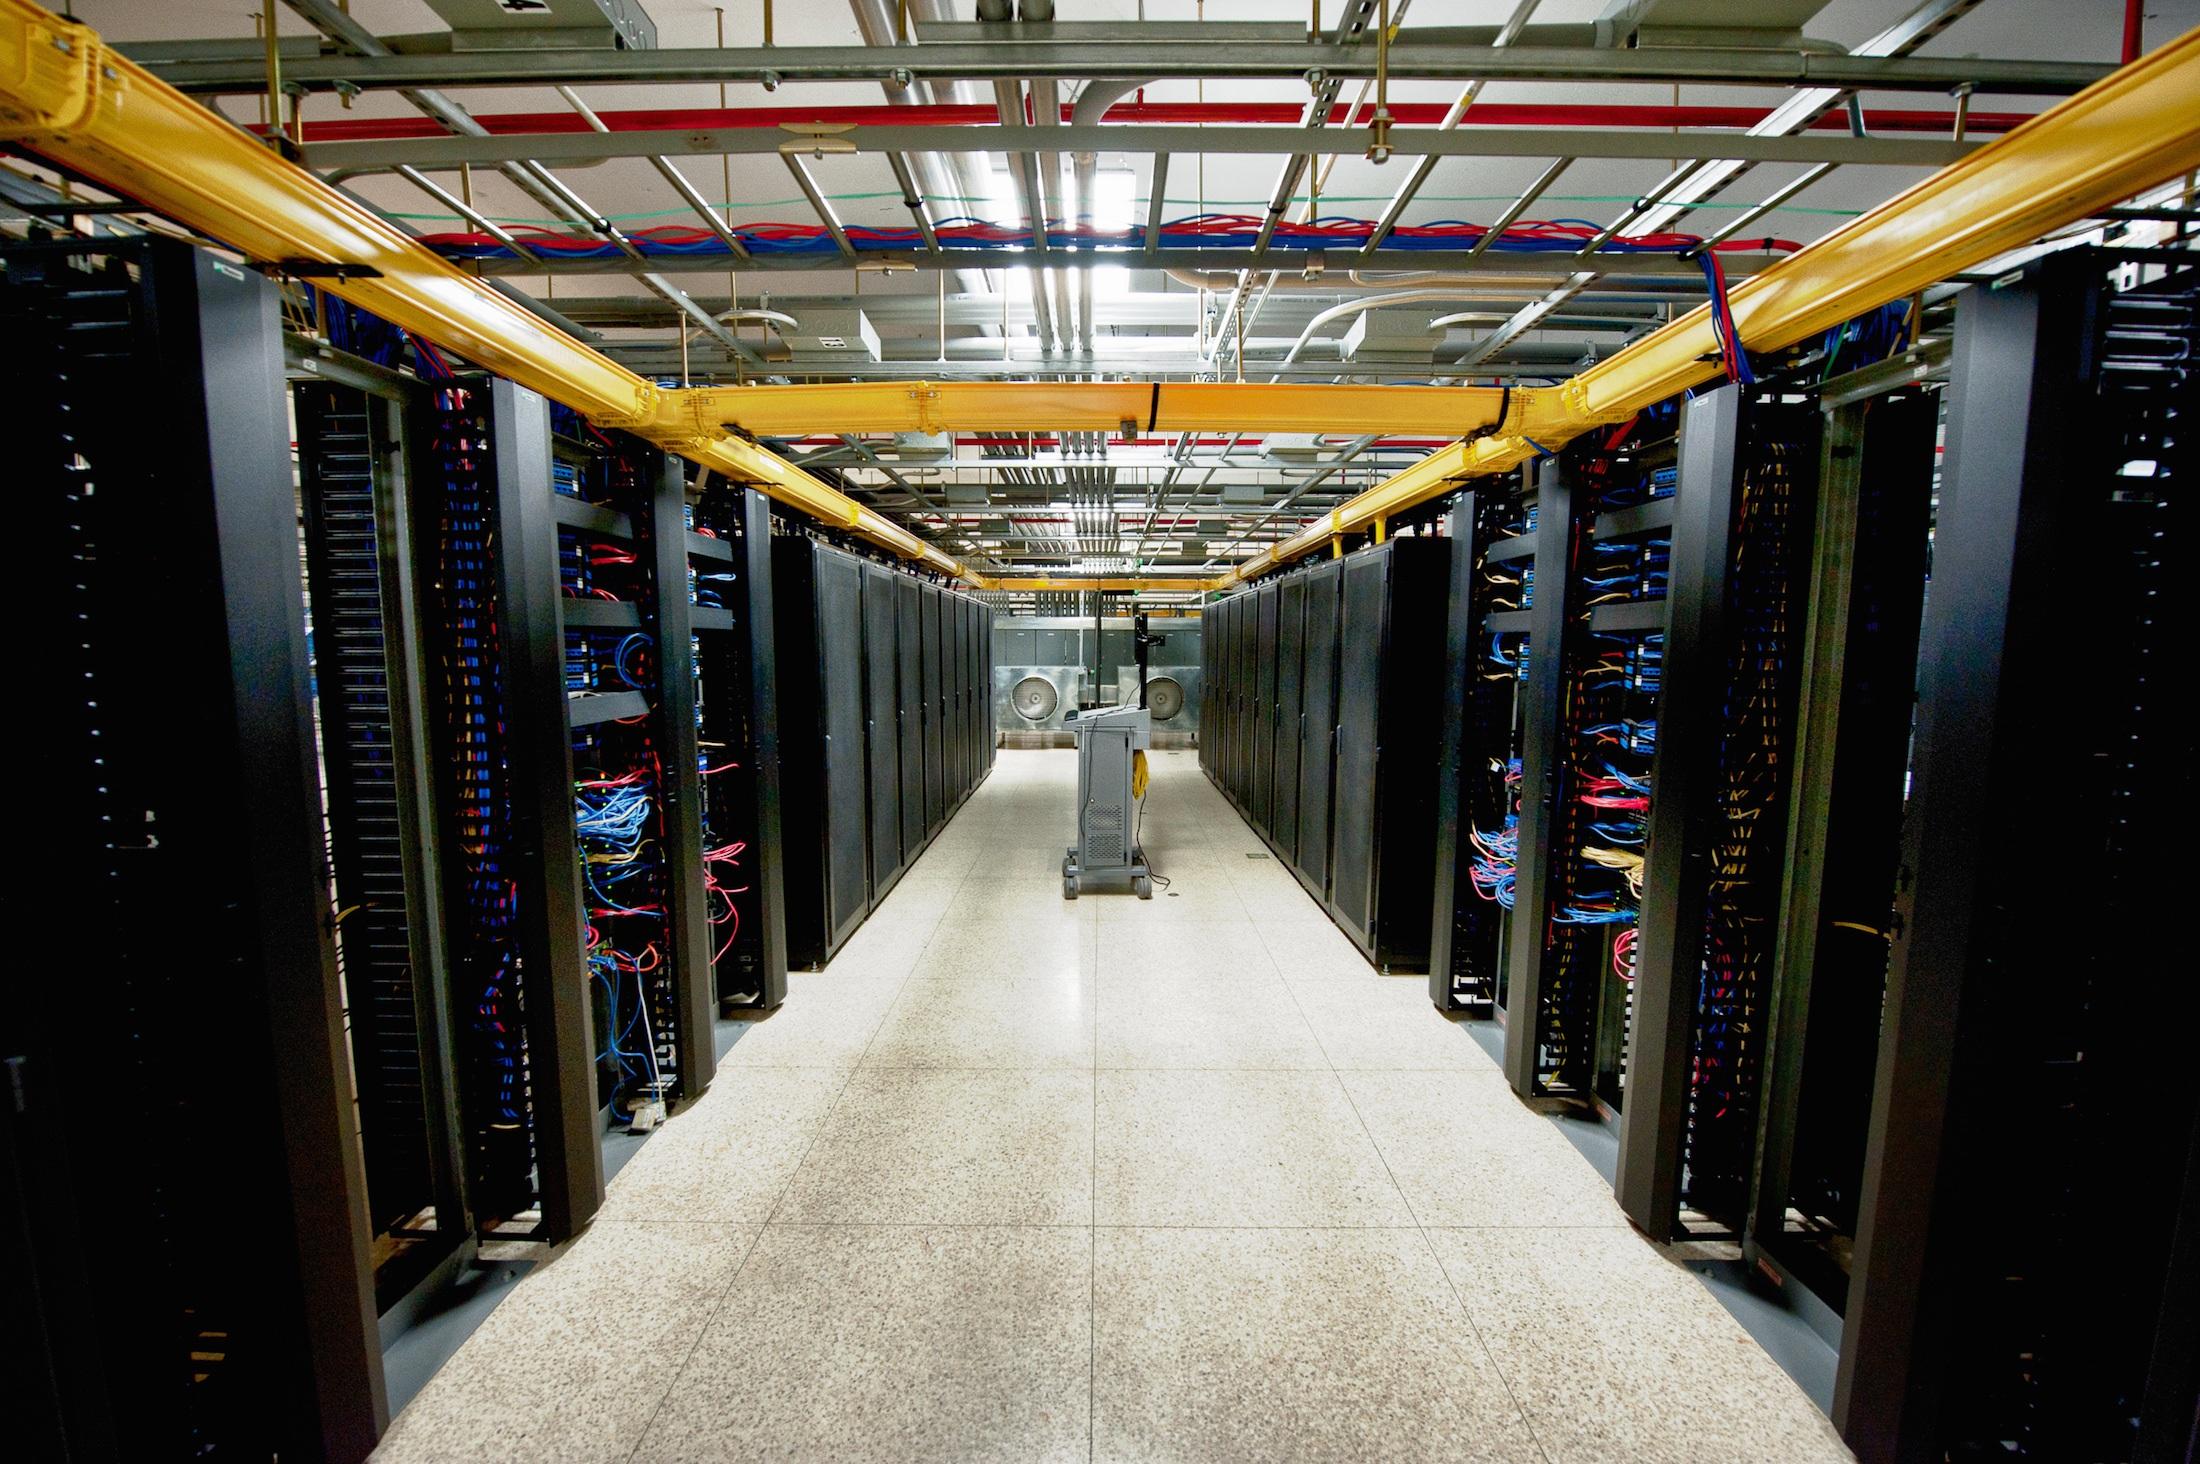 Expanding IoT Market Demands Better Performance From Data Centers